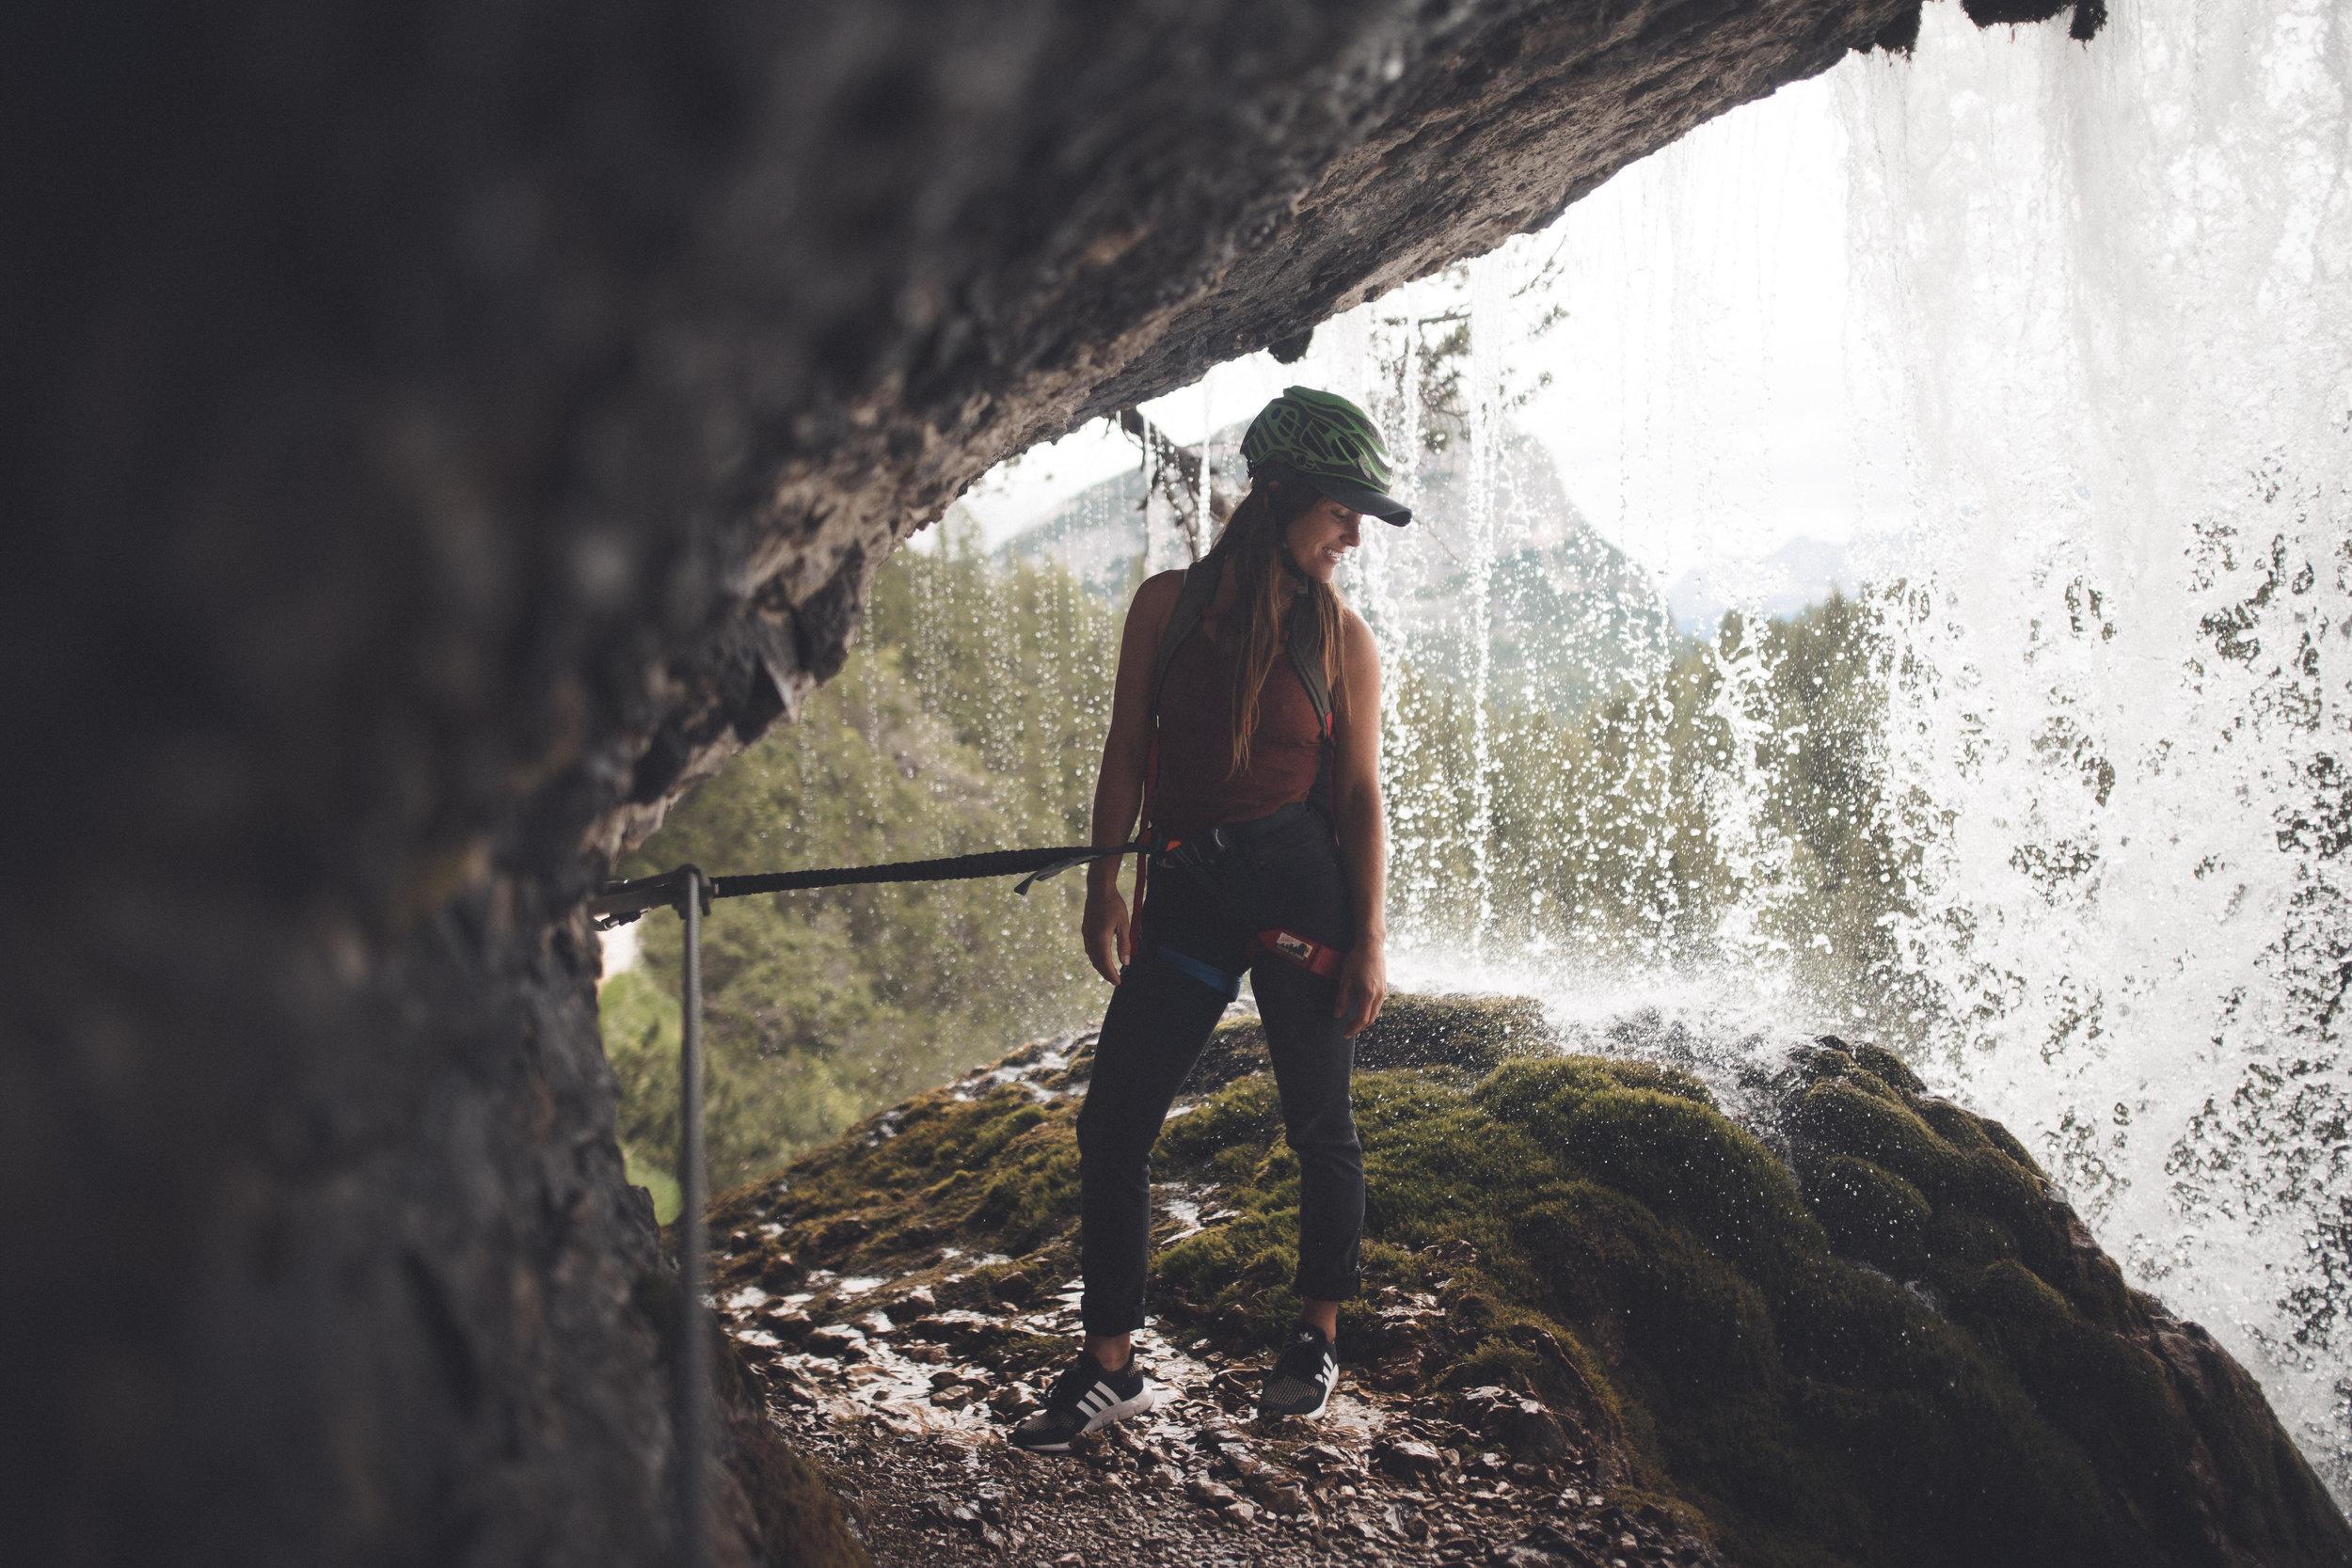 Megkee_waterfalls.jpg